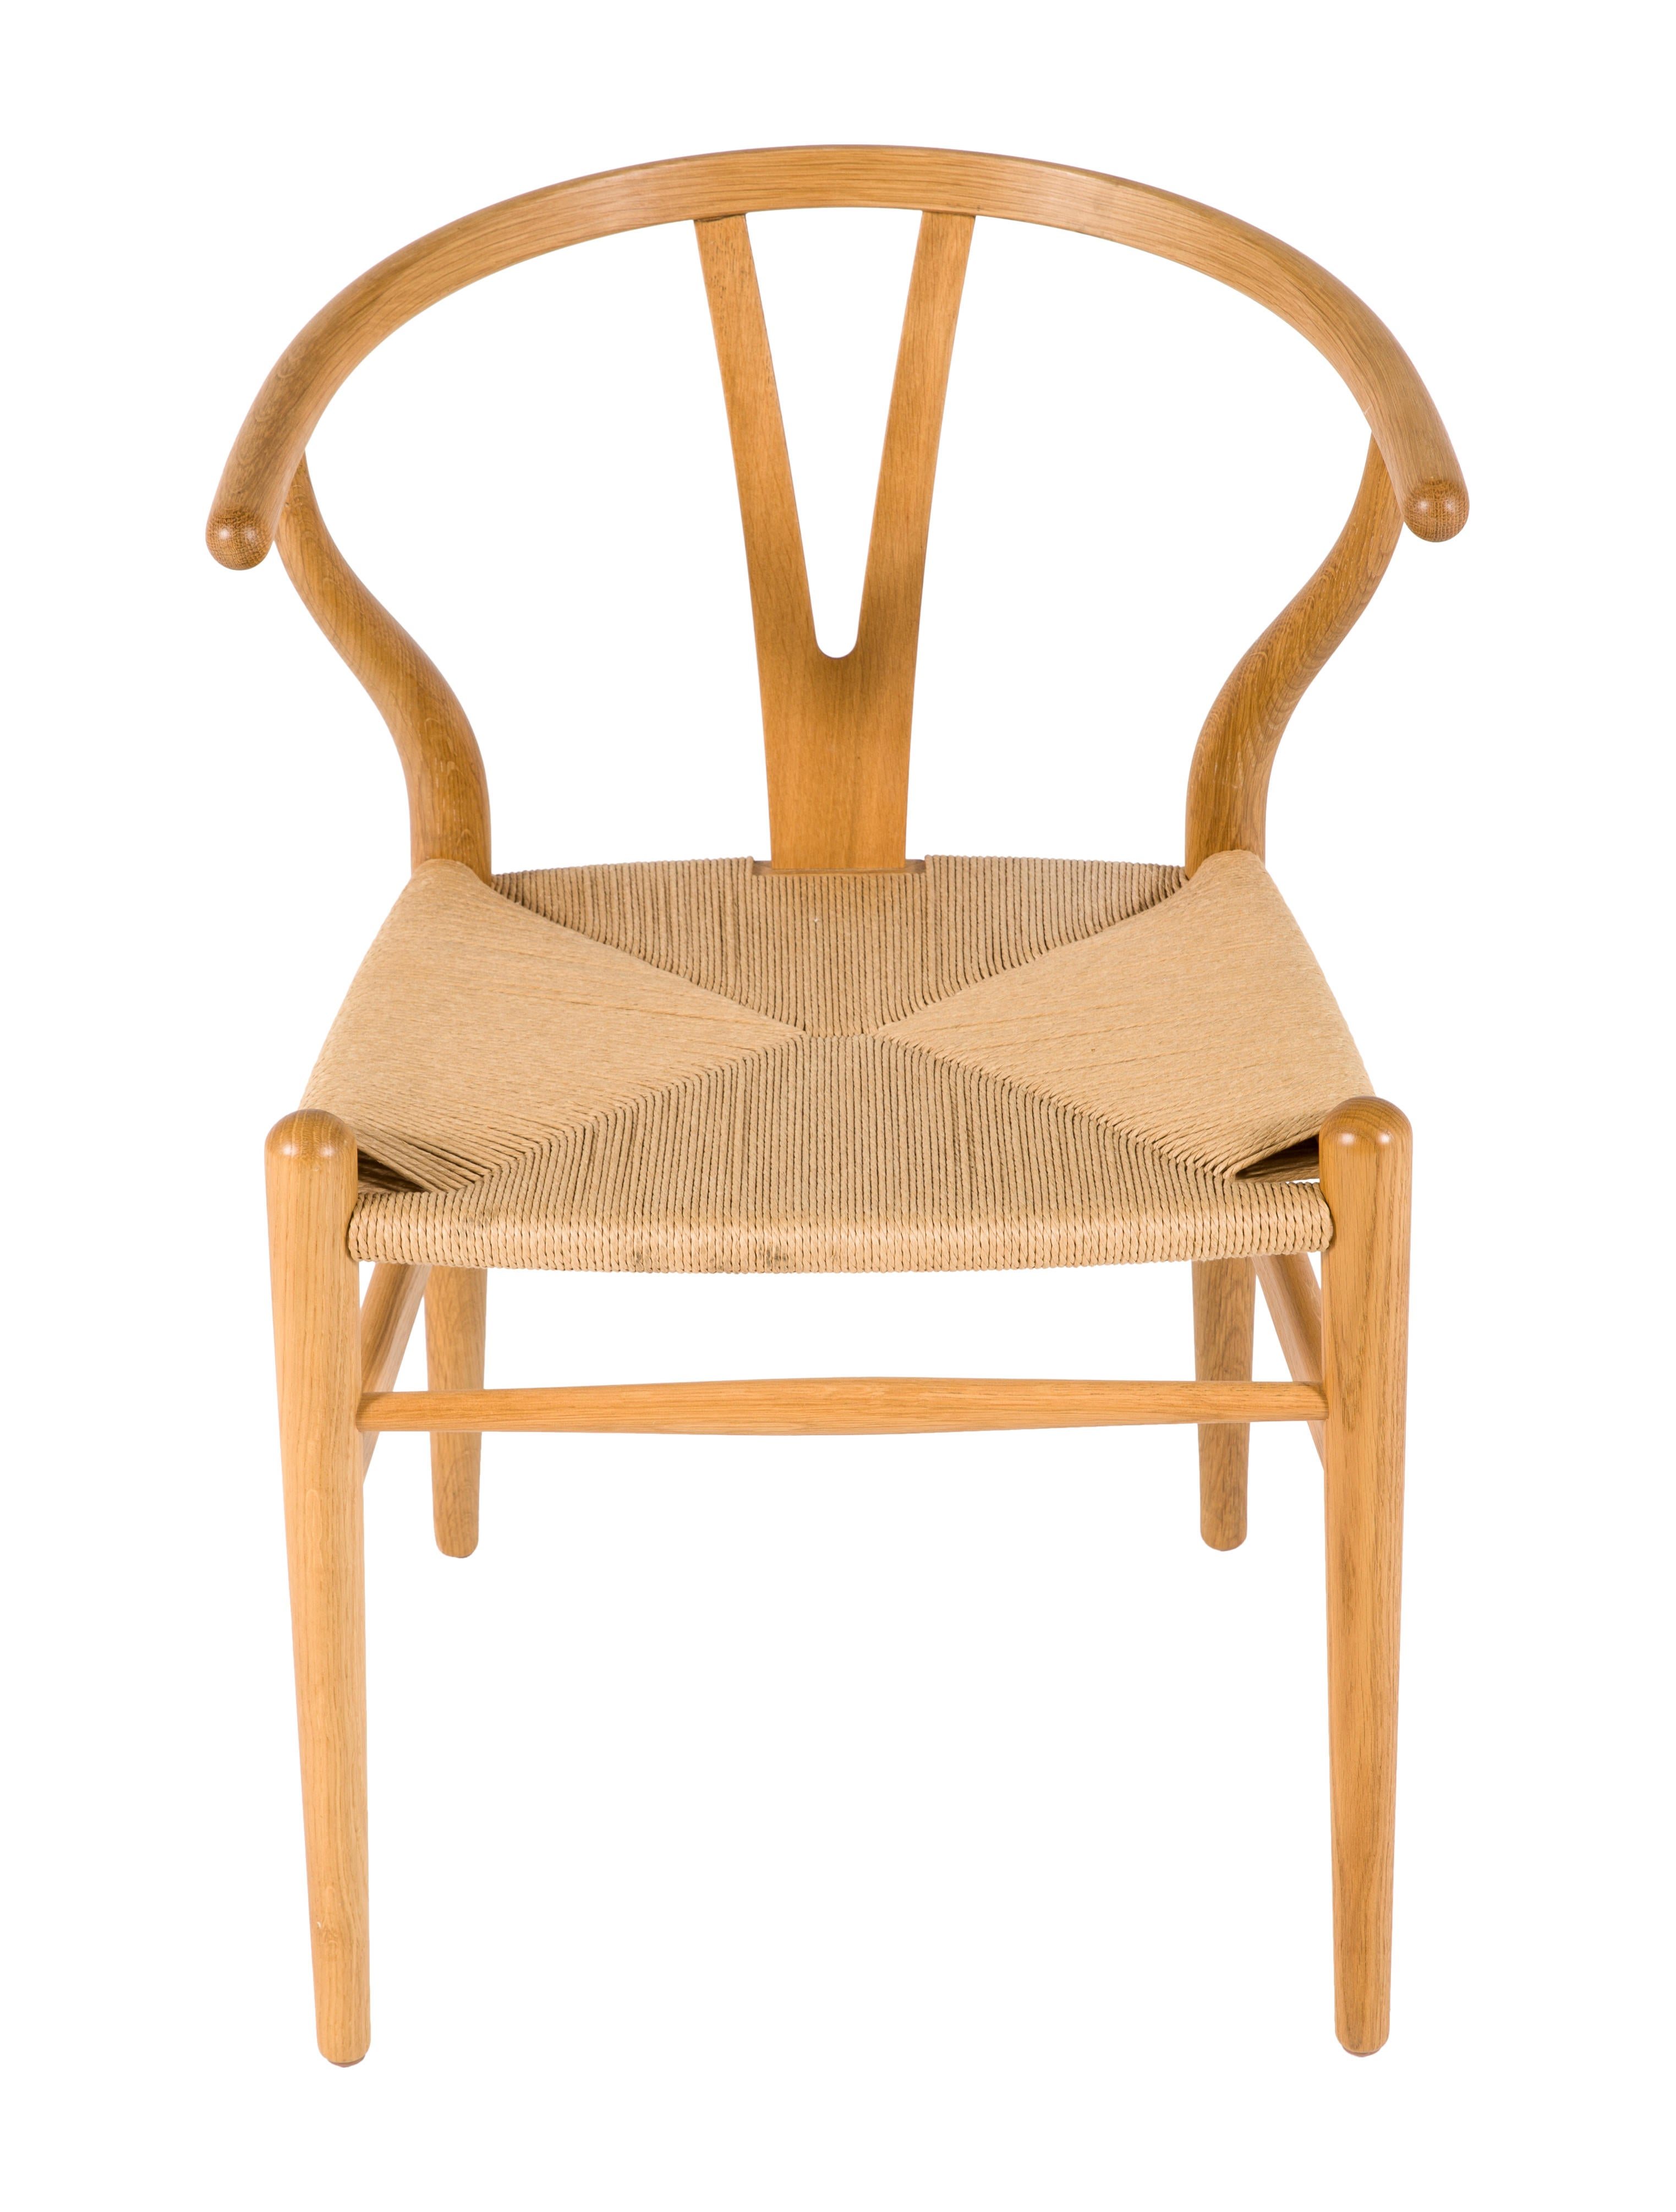 carl hansen son hans wegner wishbone chair furniture. Black Bedroom Furniture Sets. Home Design Ideas